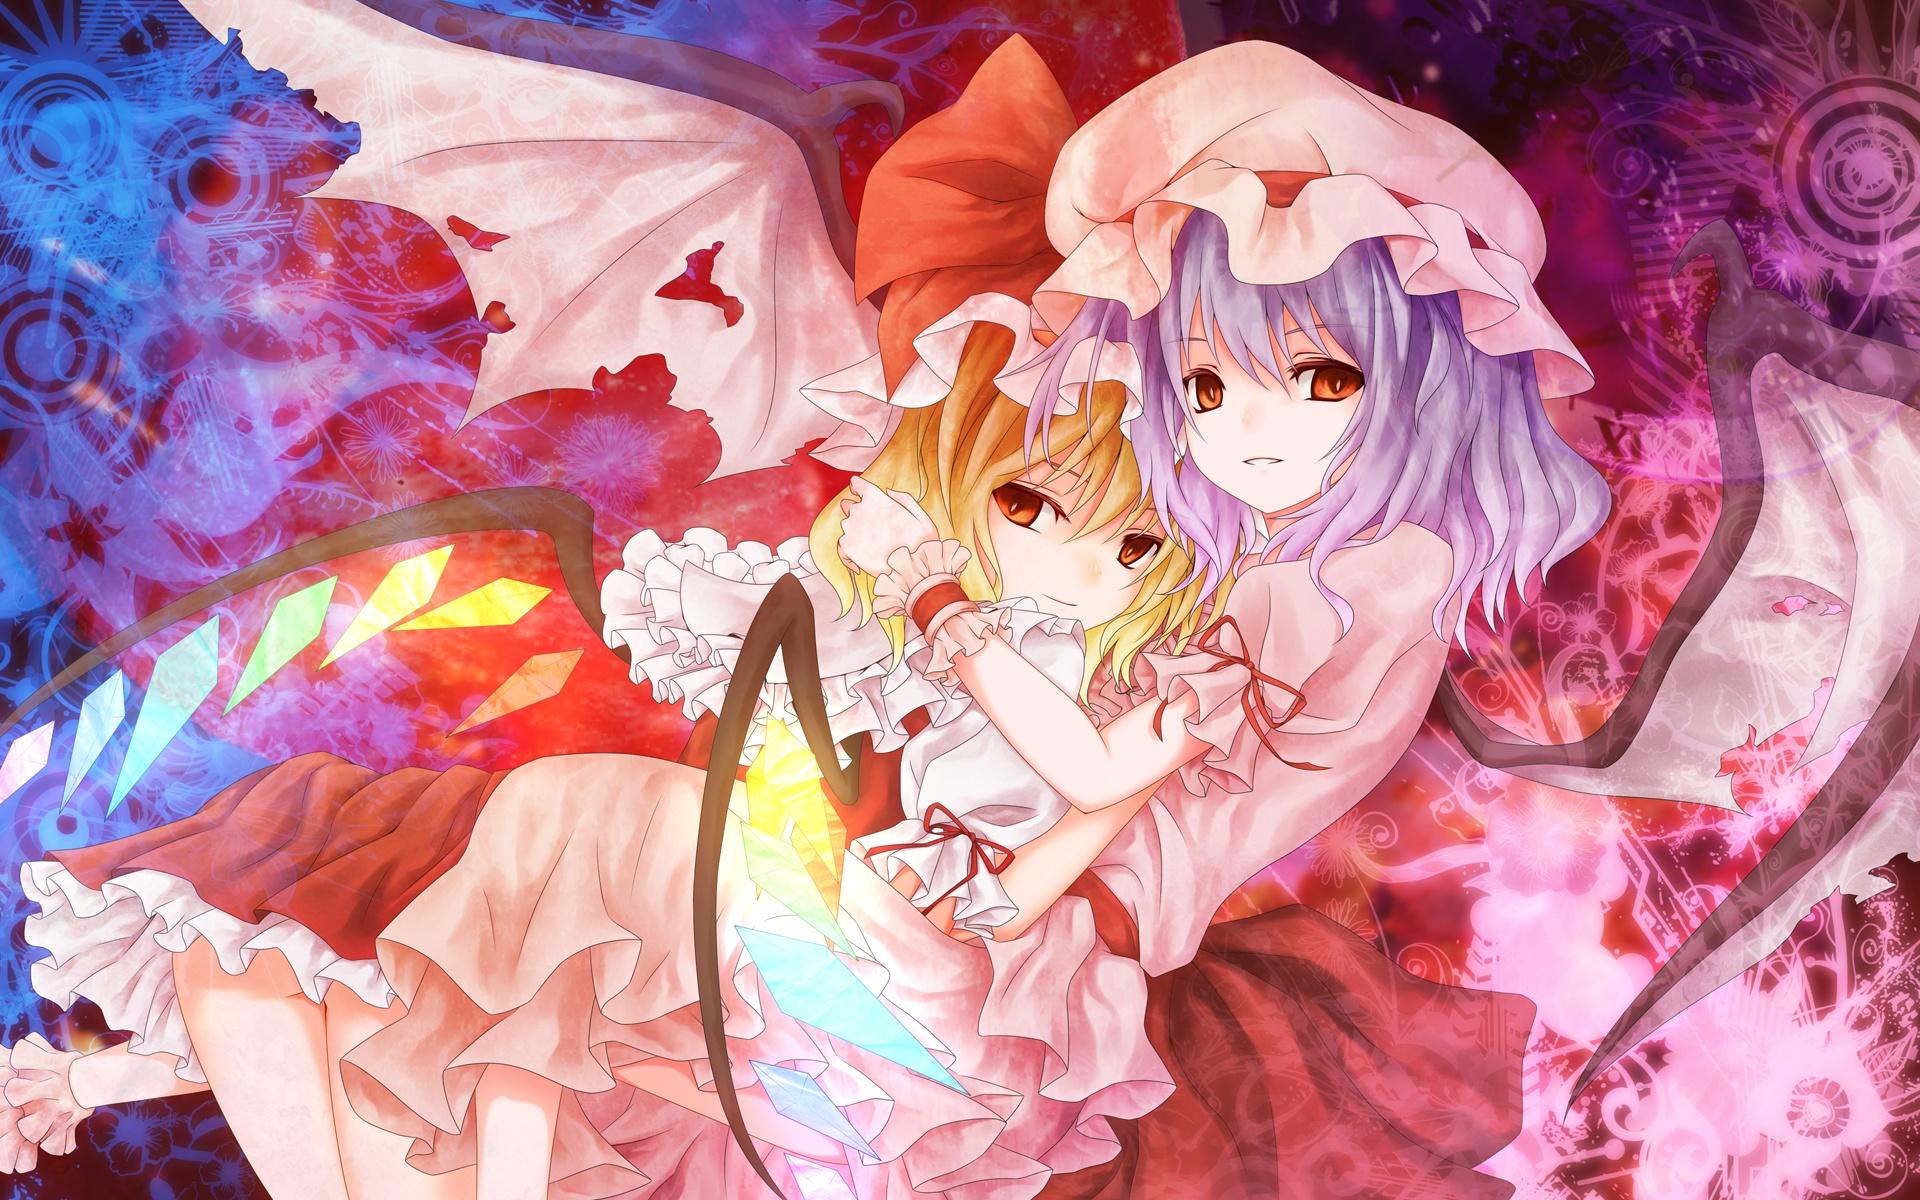 blonde_hair dress flandre_scarlet kamumiya purple_hair red_eyes remilia_scarlet ribbons short_hair touhou vampire wings